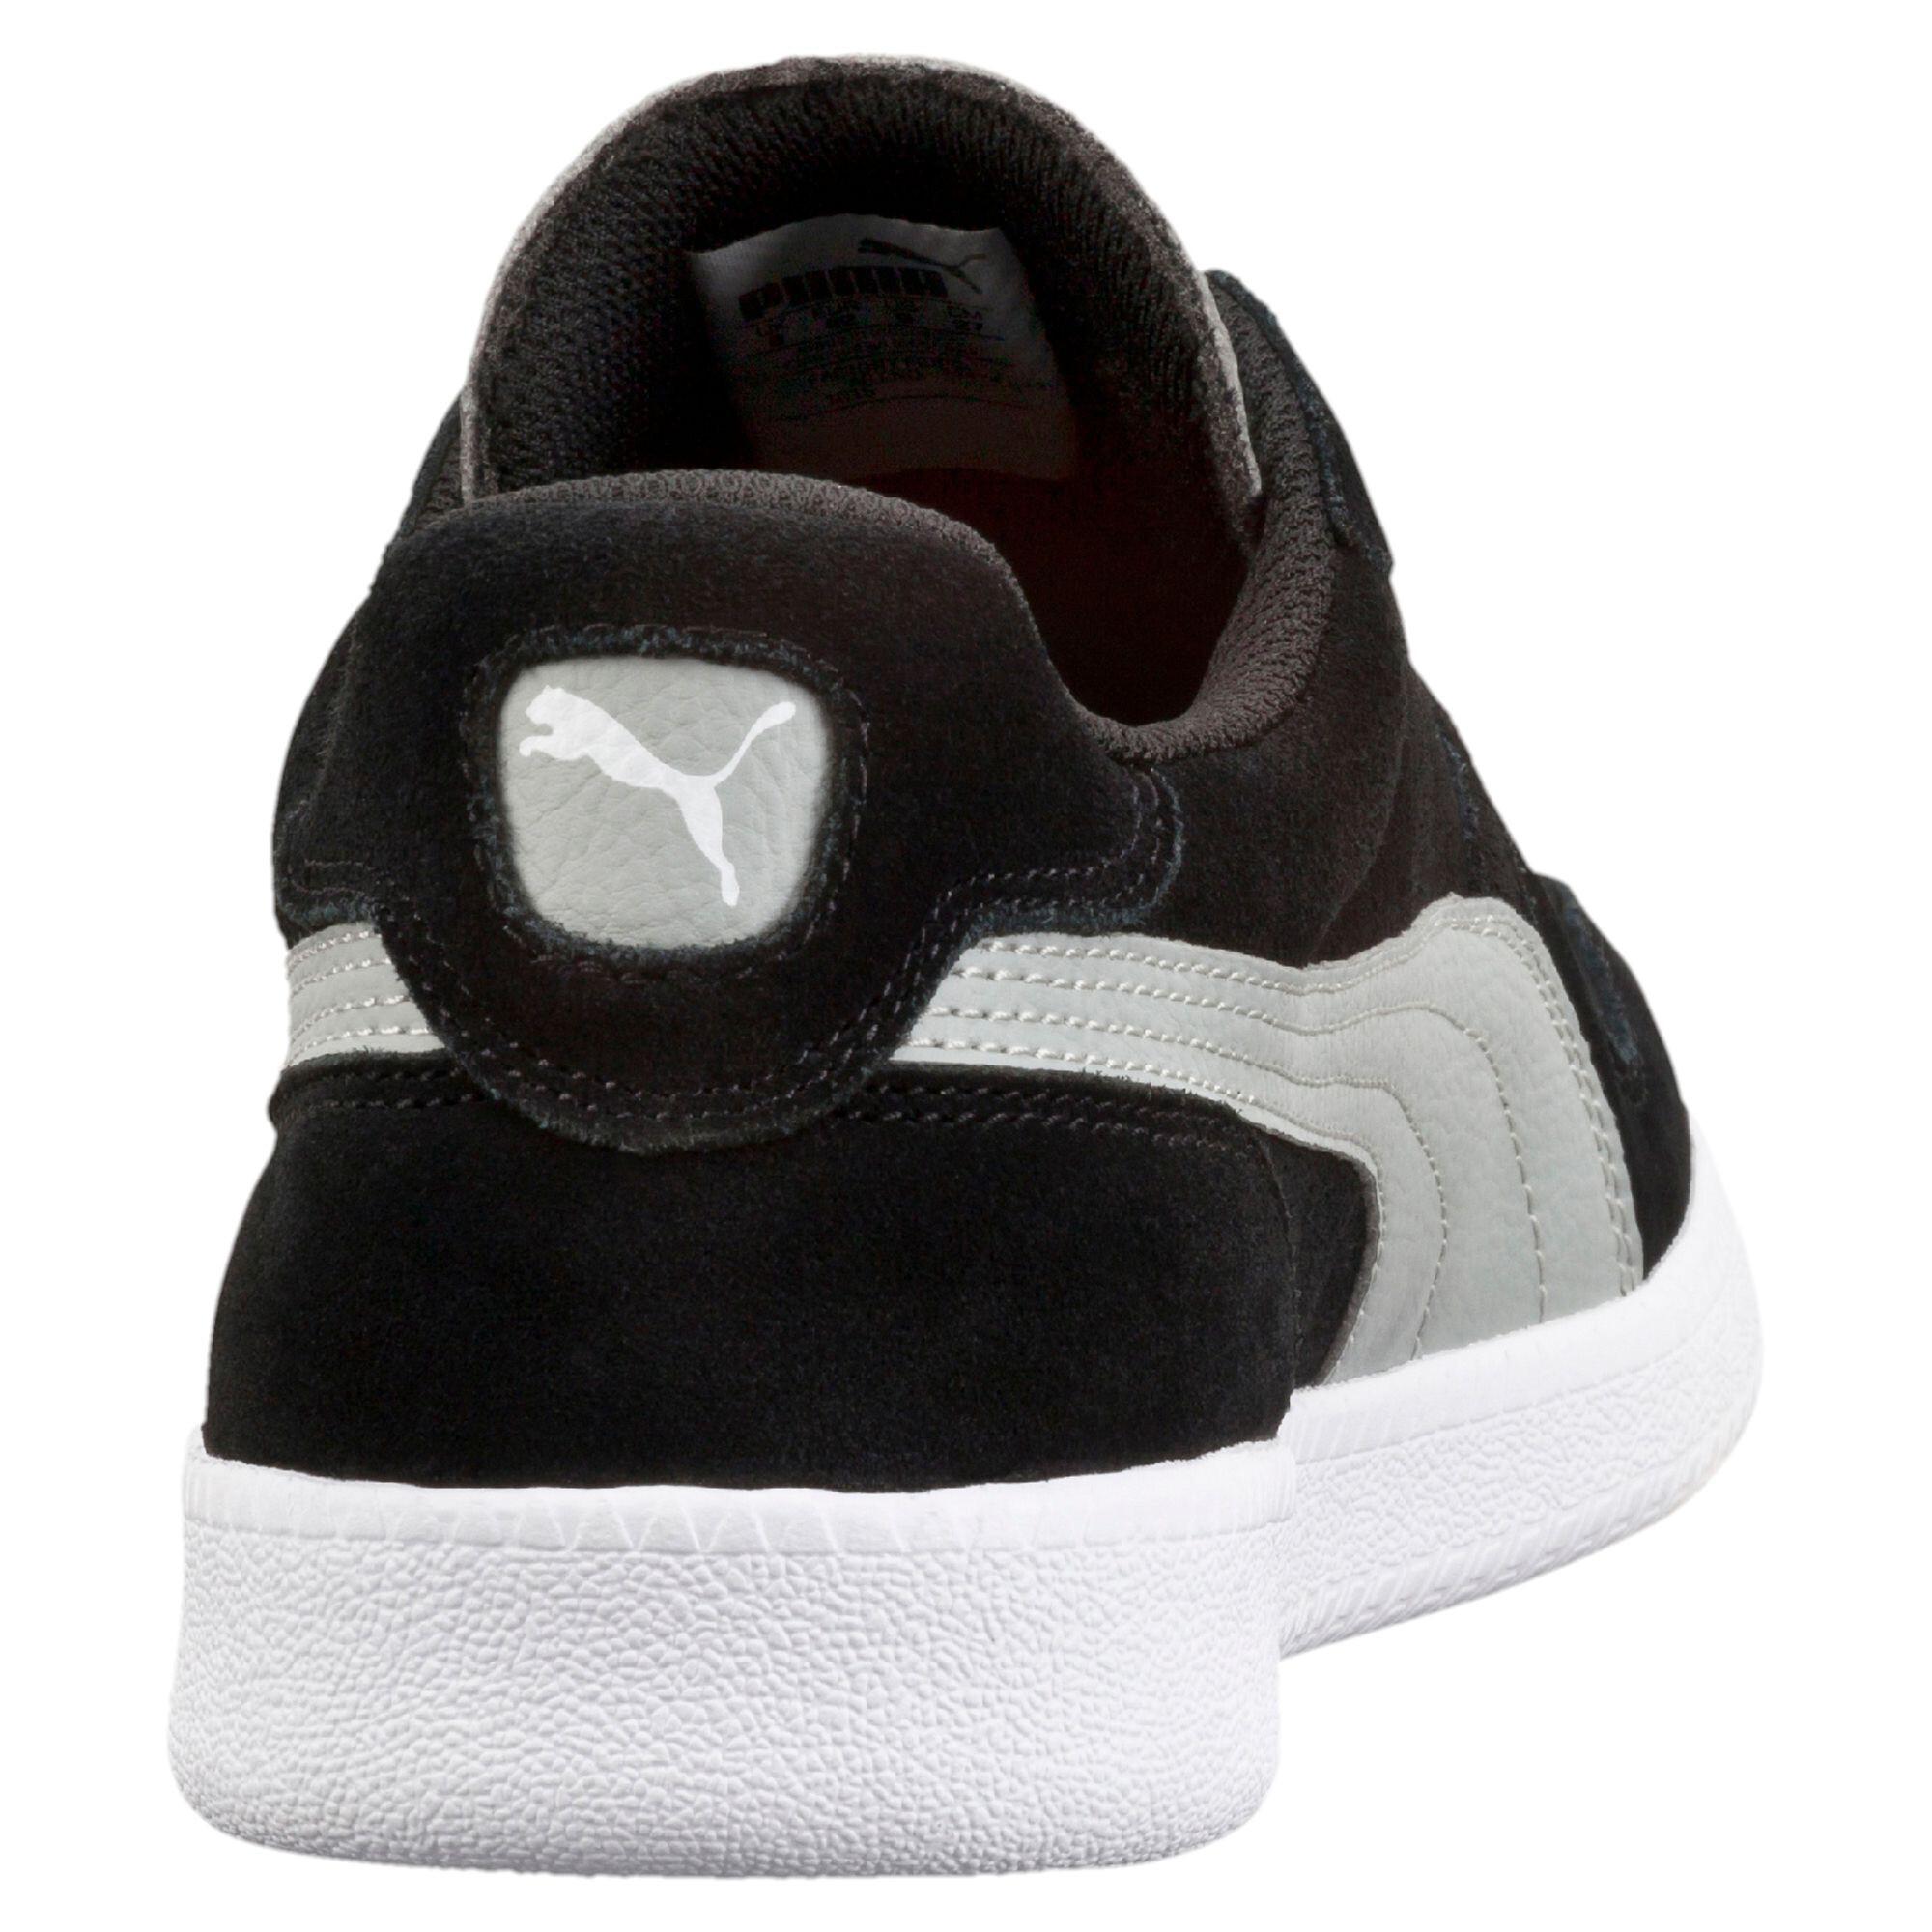 Image Puma Icra Suede Men's Sneakers #5